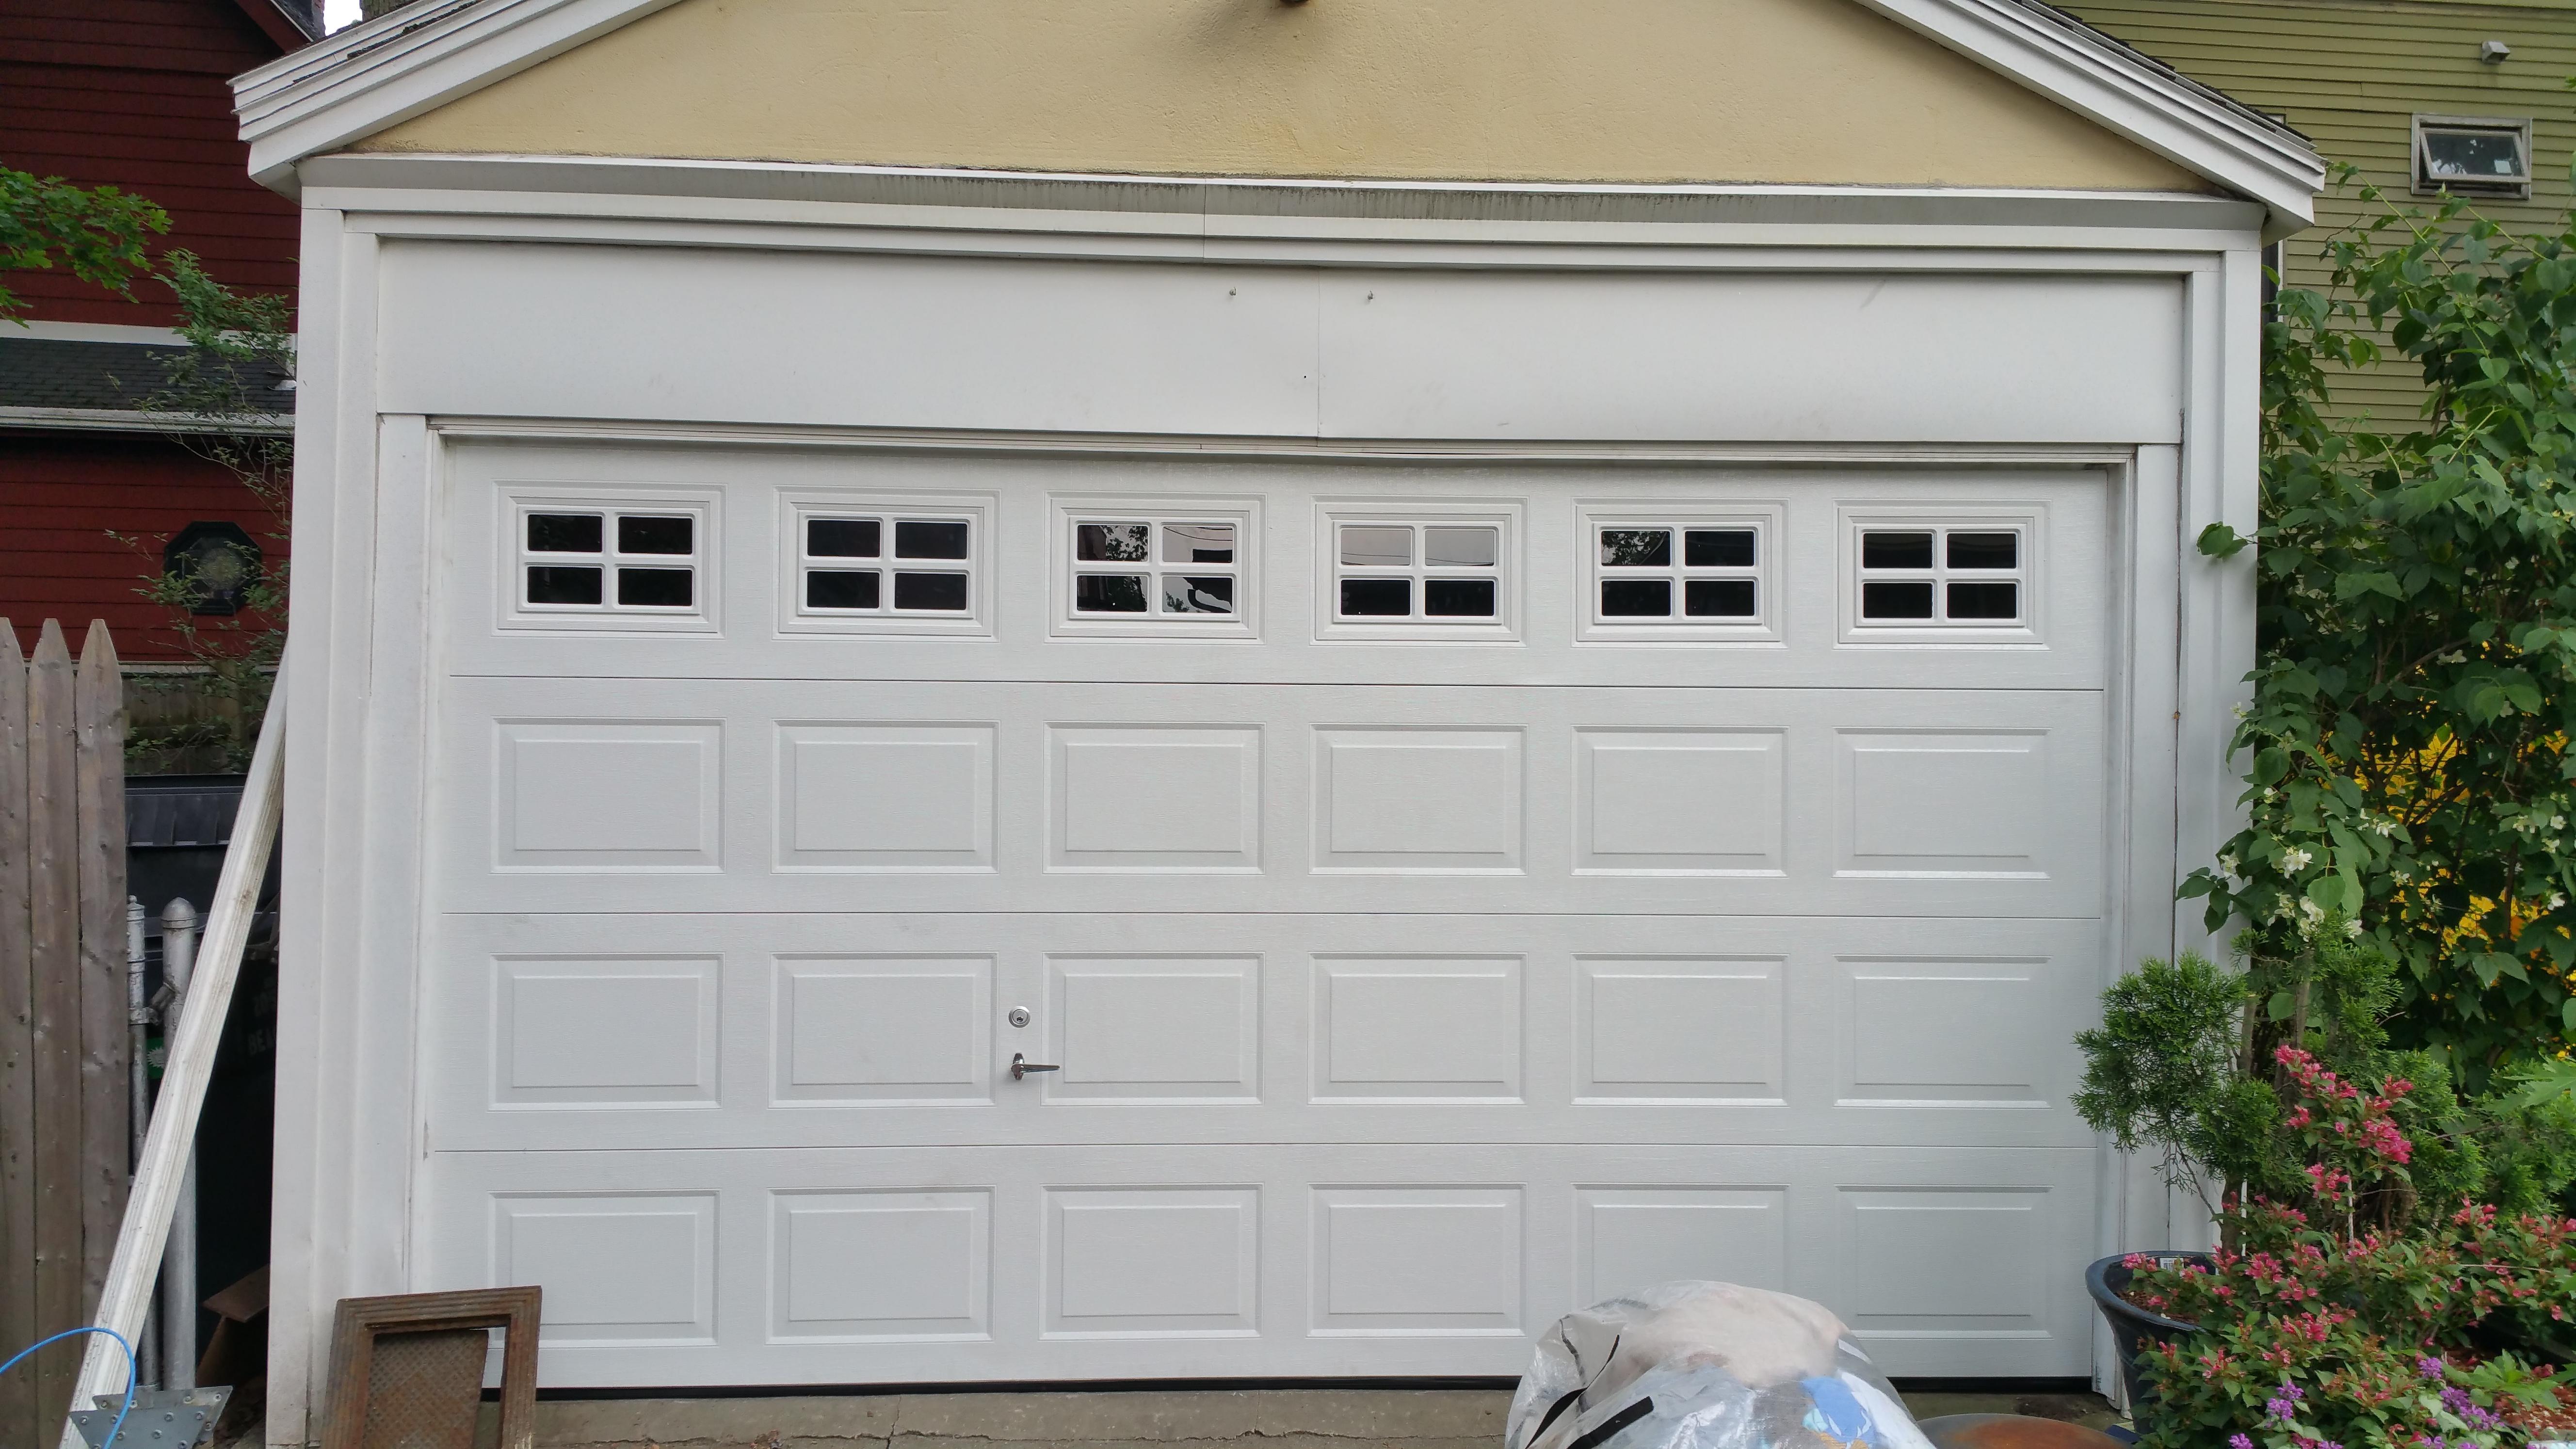 Mass Garage Doors Expert image 1